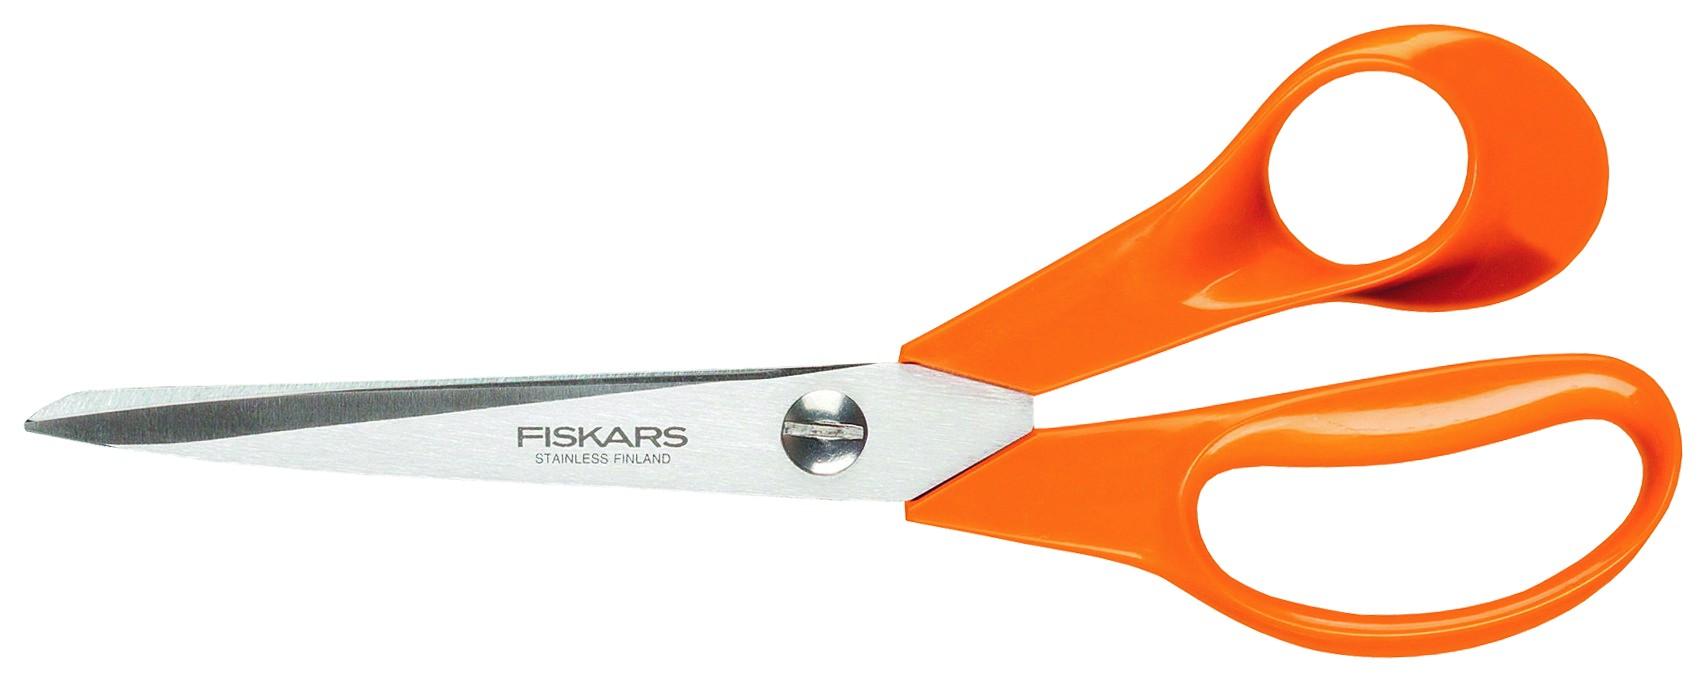 Nożyczki Fiskars S90